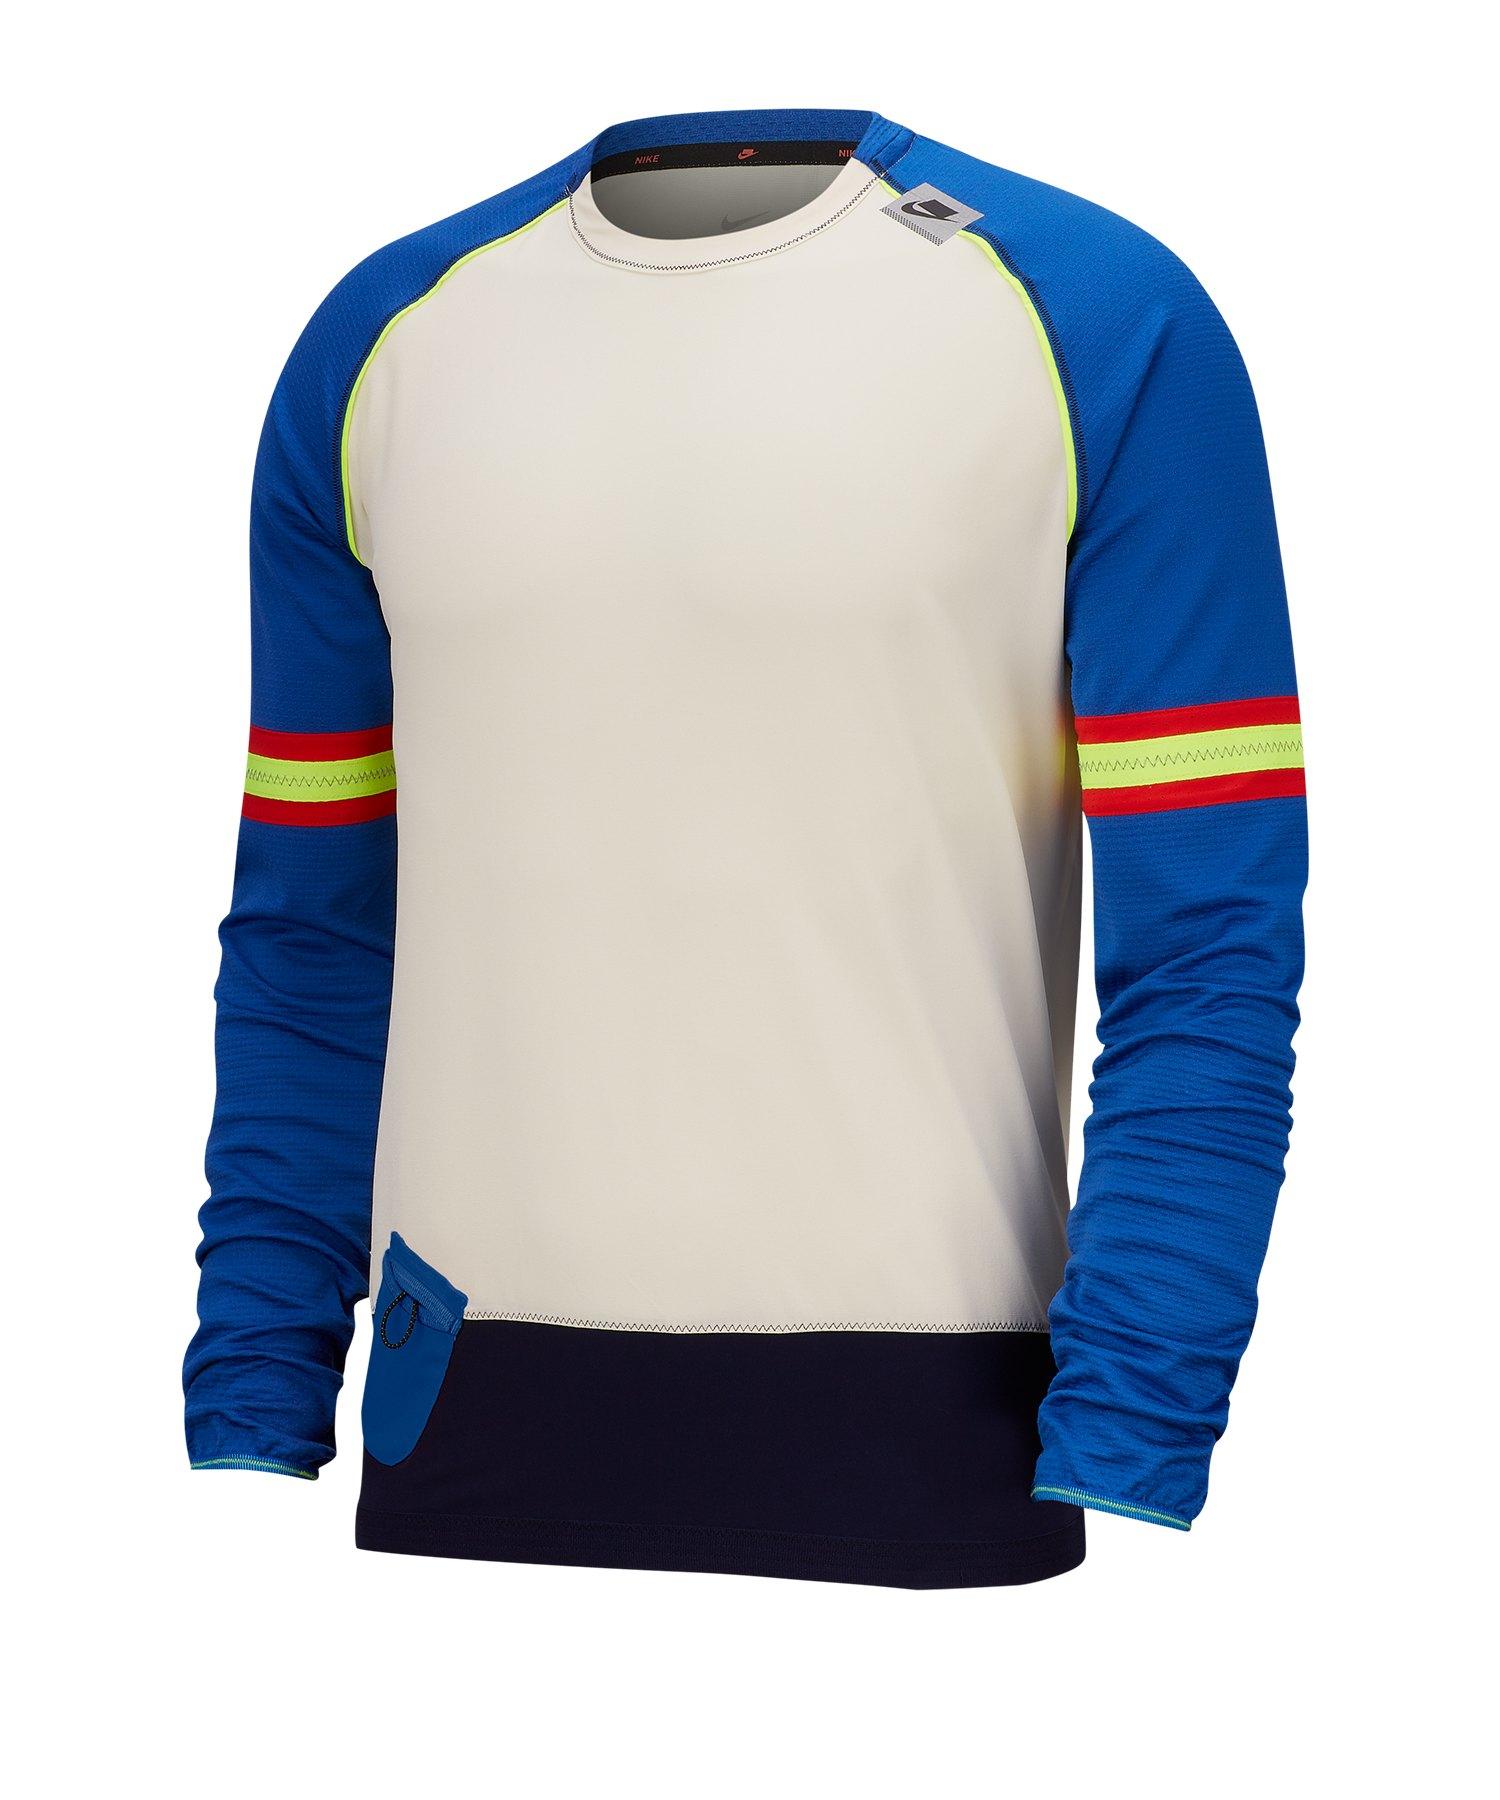 Nike Long-Sleeve Top T-Shirt langarm Running F110 - weiss